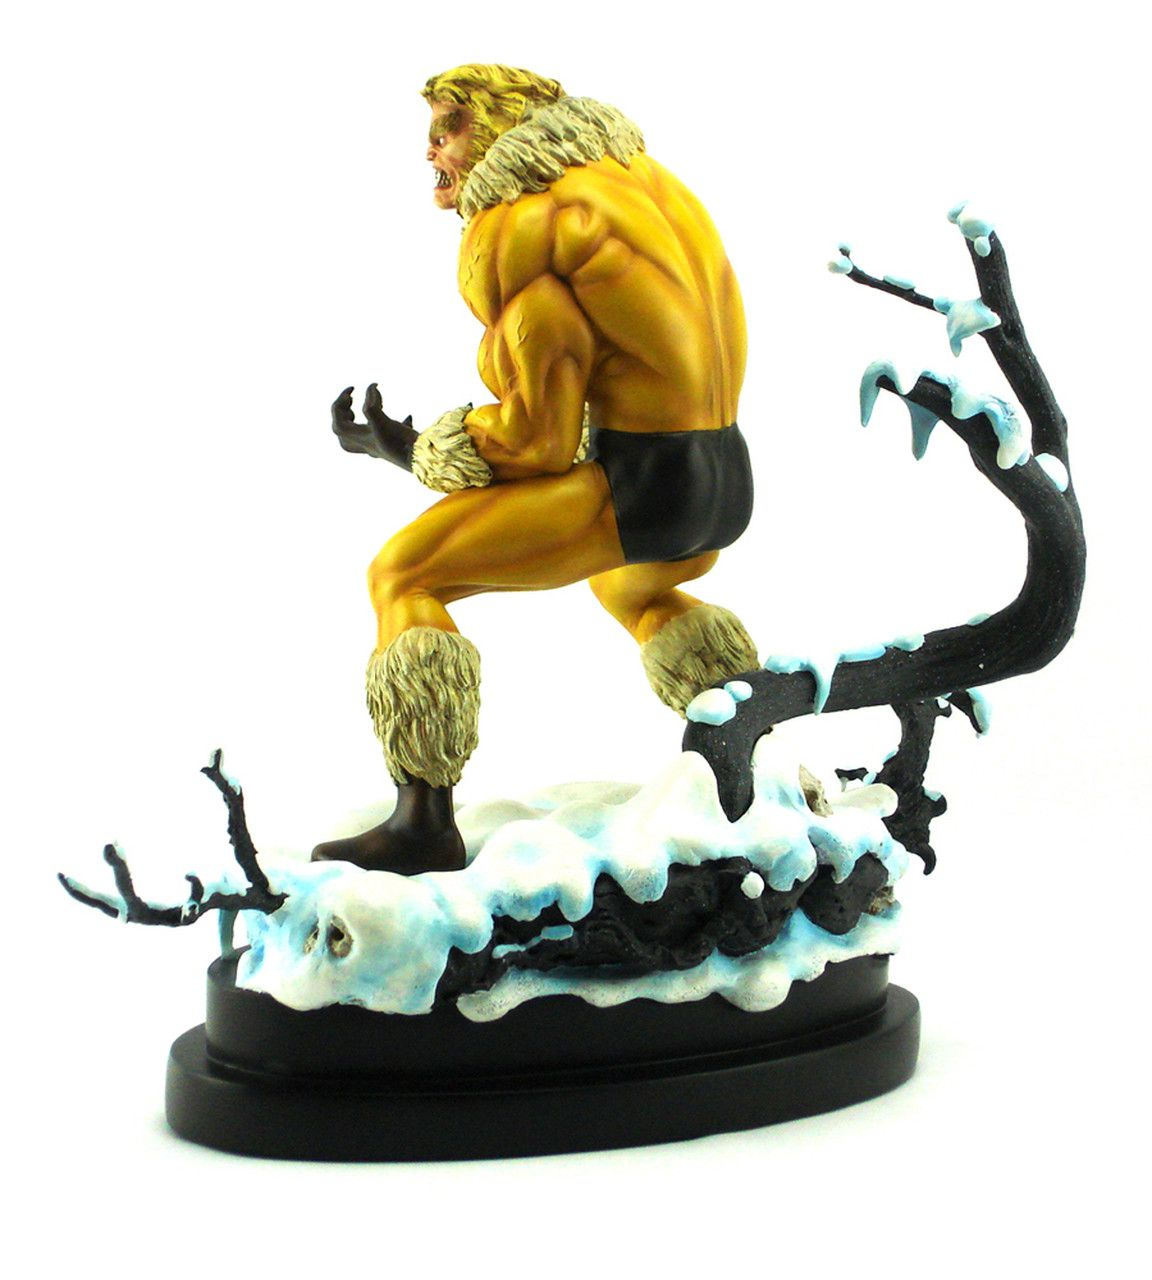 Estátua Dentes-de-Sabre (Sabretooth): Marvel Comics (Painted Statue) - Bowen Designs